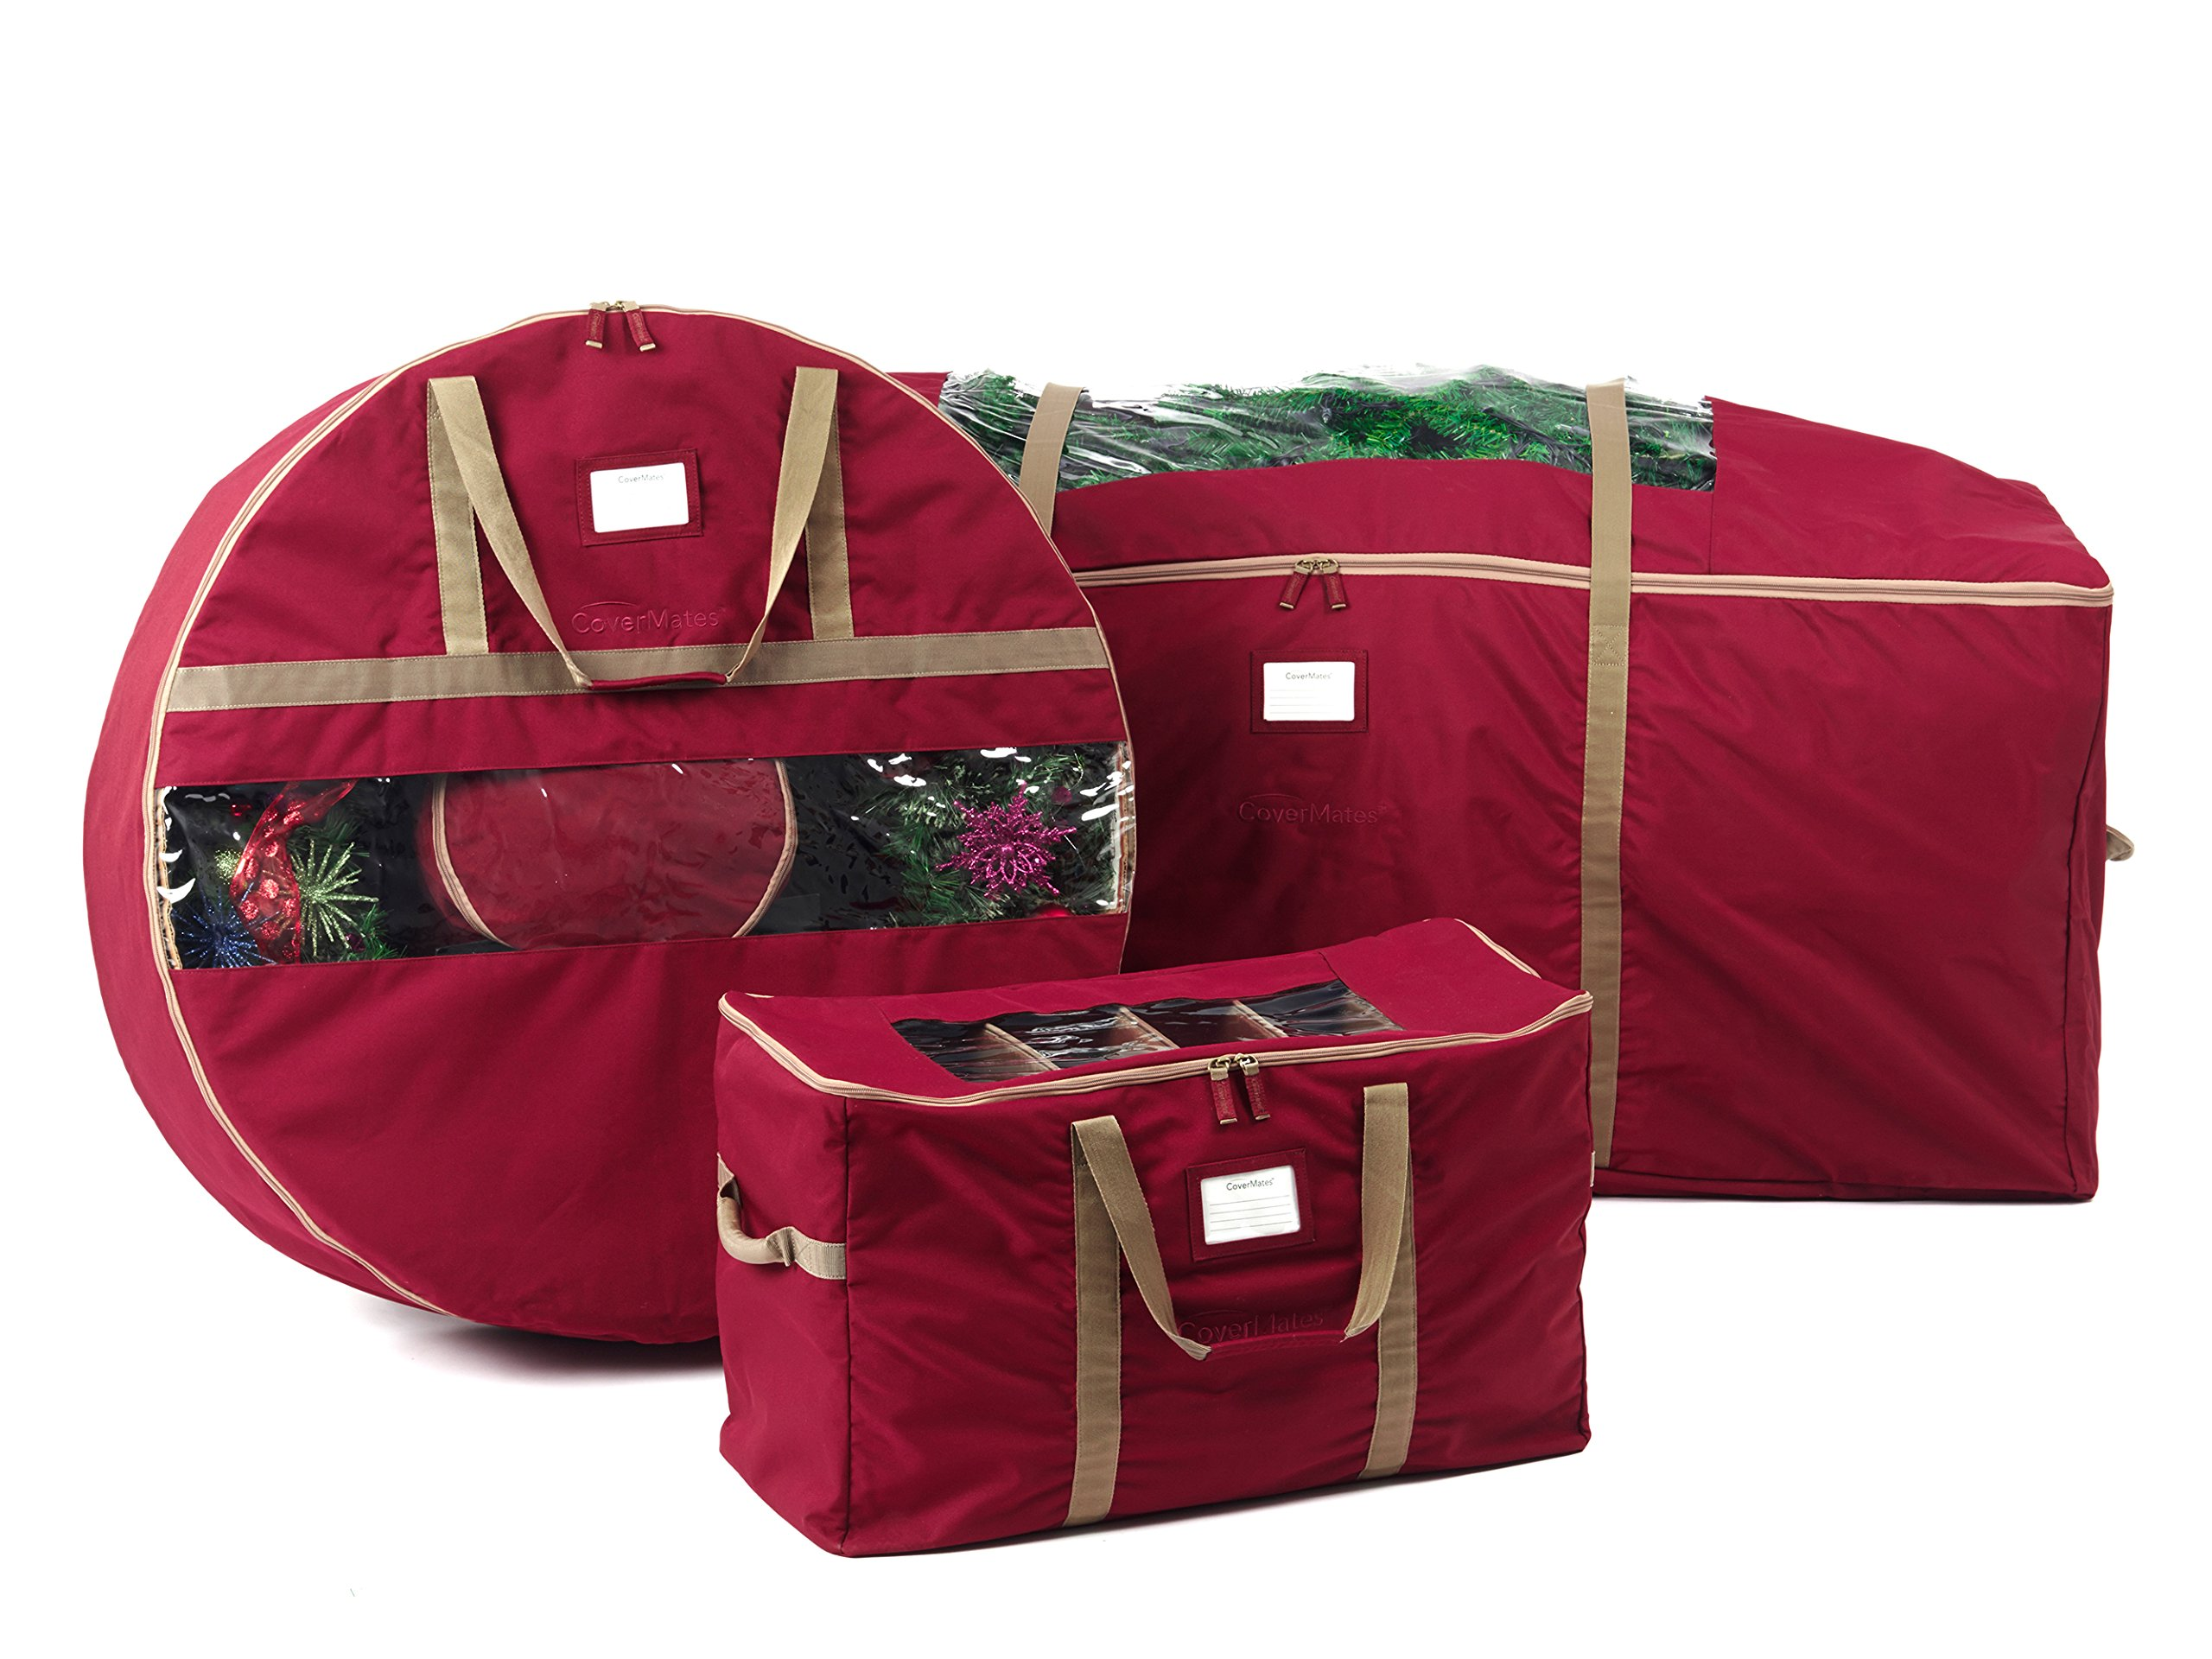 CoverMates – 3PC Holiday Storage Set (60'' Tree Storage Bag + 36'' Wreath Storage + 108PC Ornament Storage Bag) – 3 Year Warranty- Red